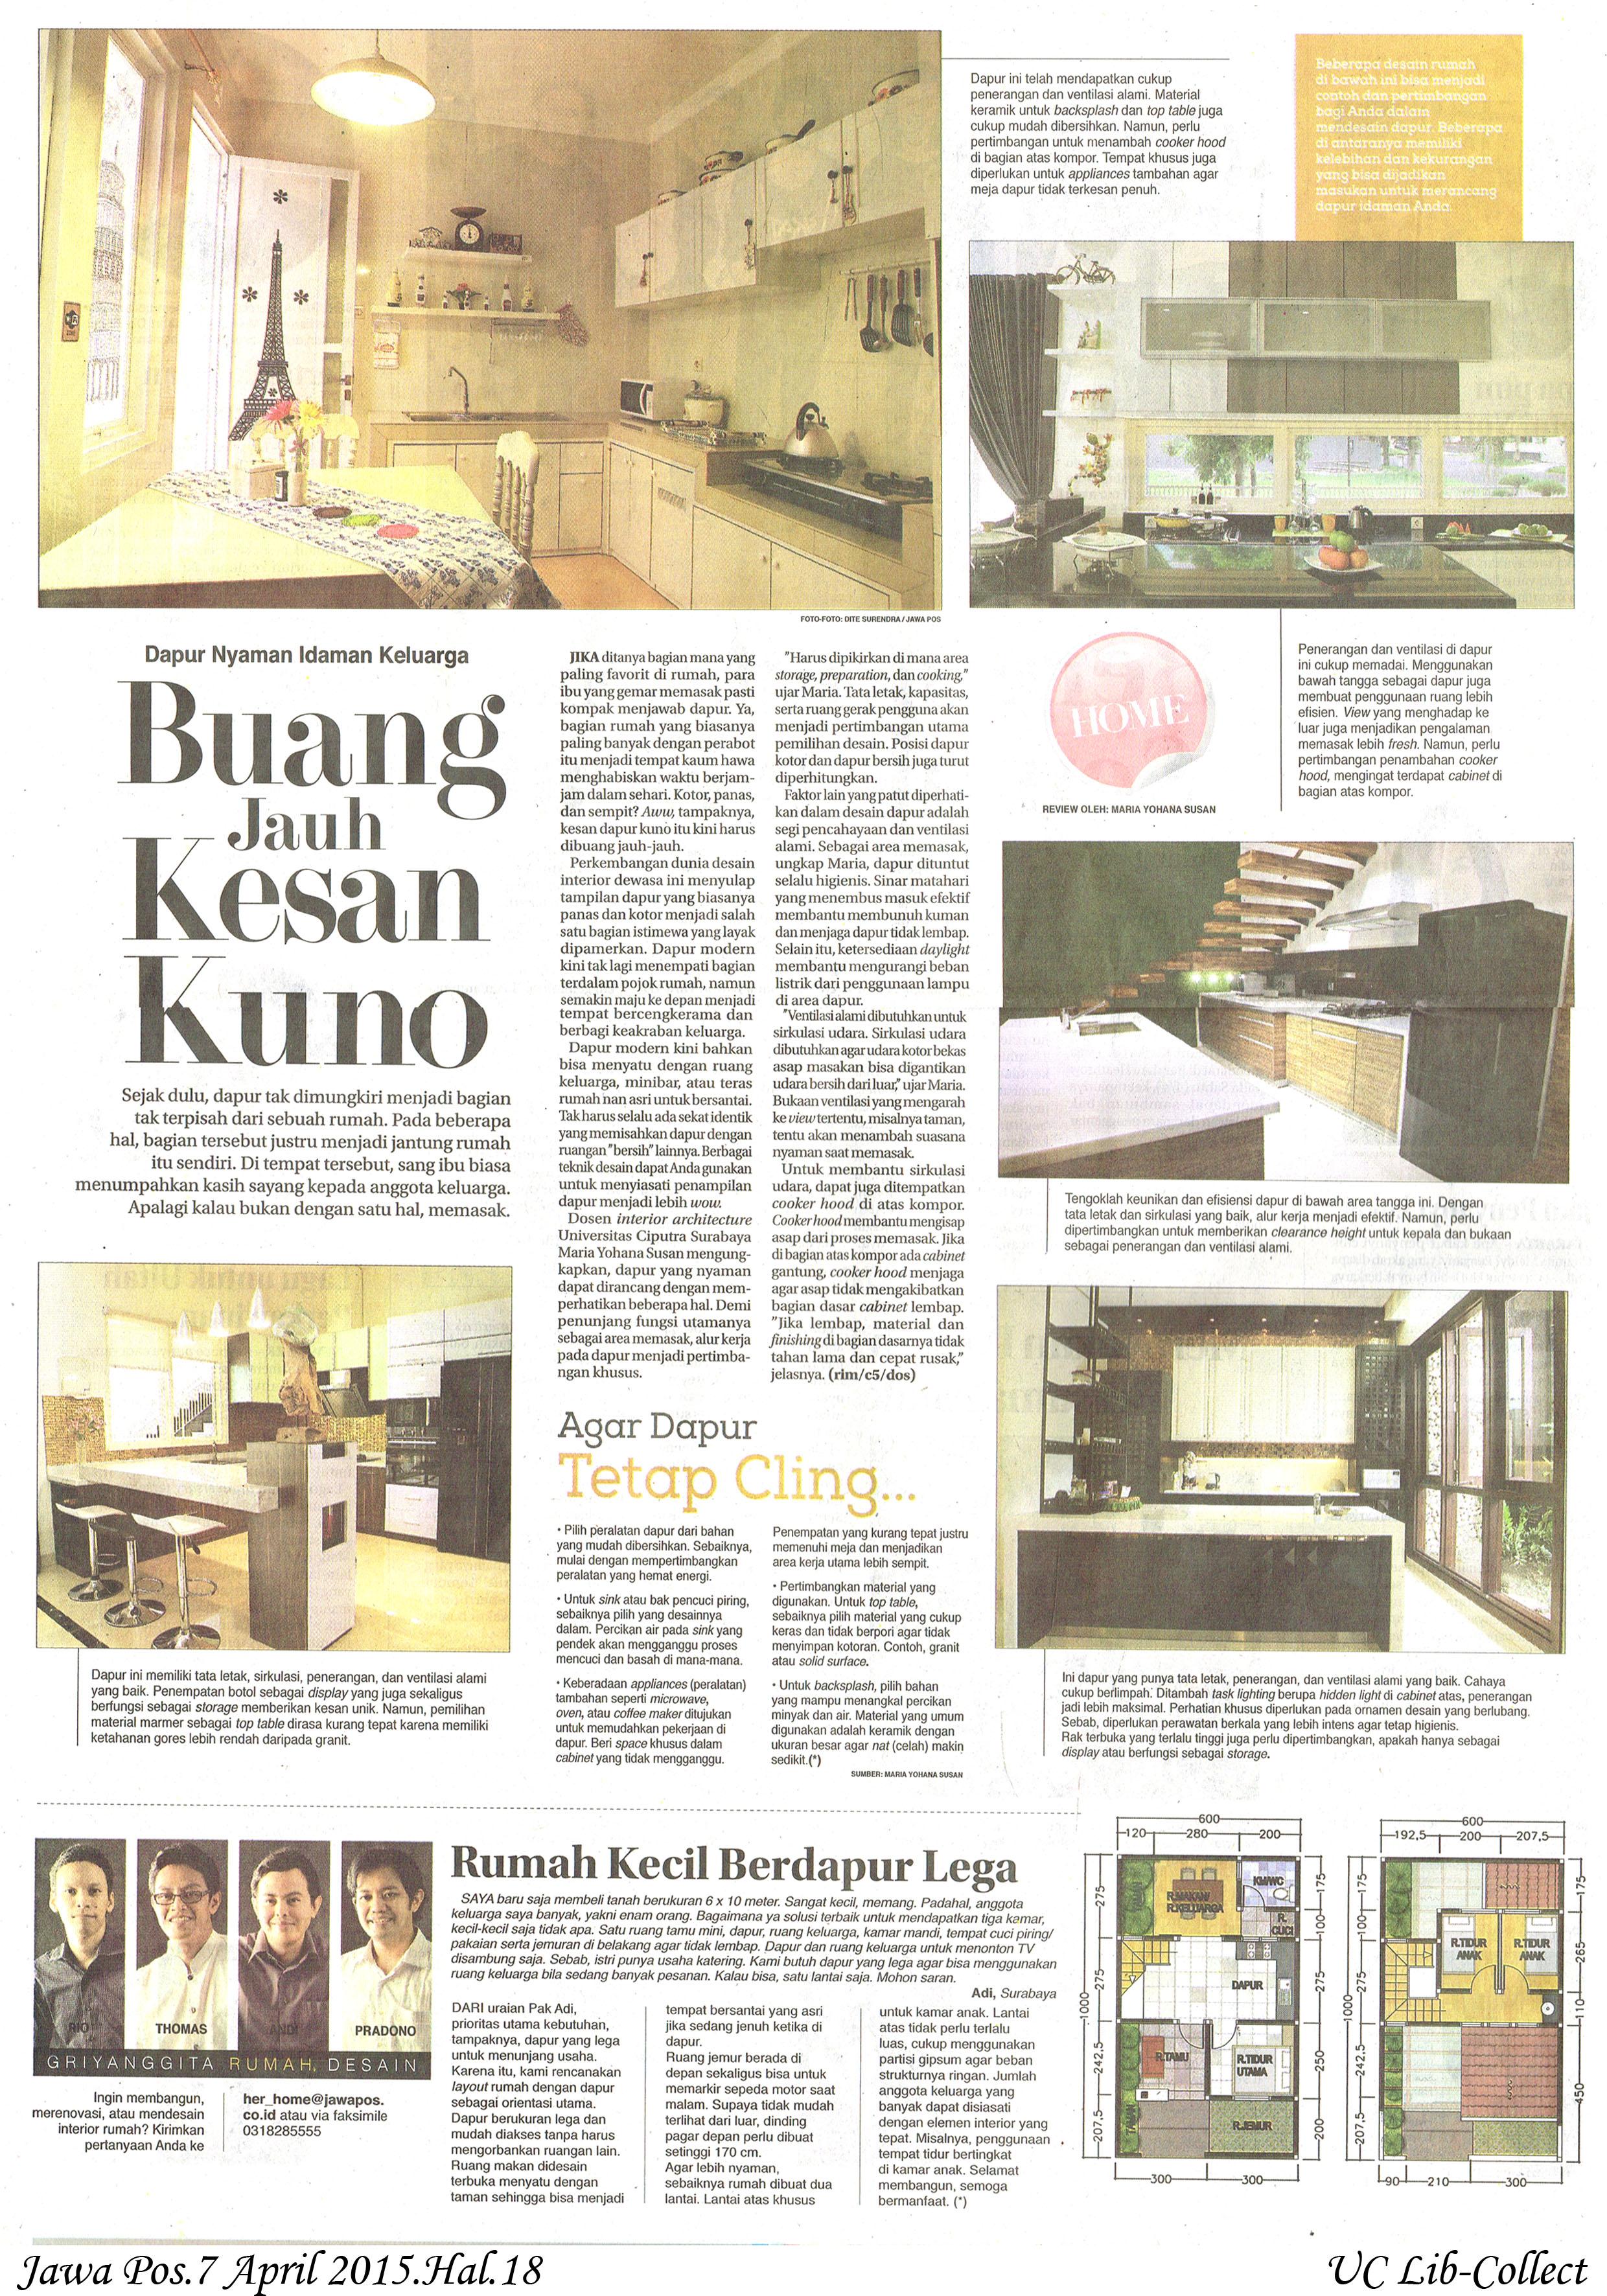 Buang Jauh Kesan Kuno. Jawa Pos.7 April 2015.Hal.18